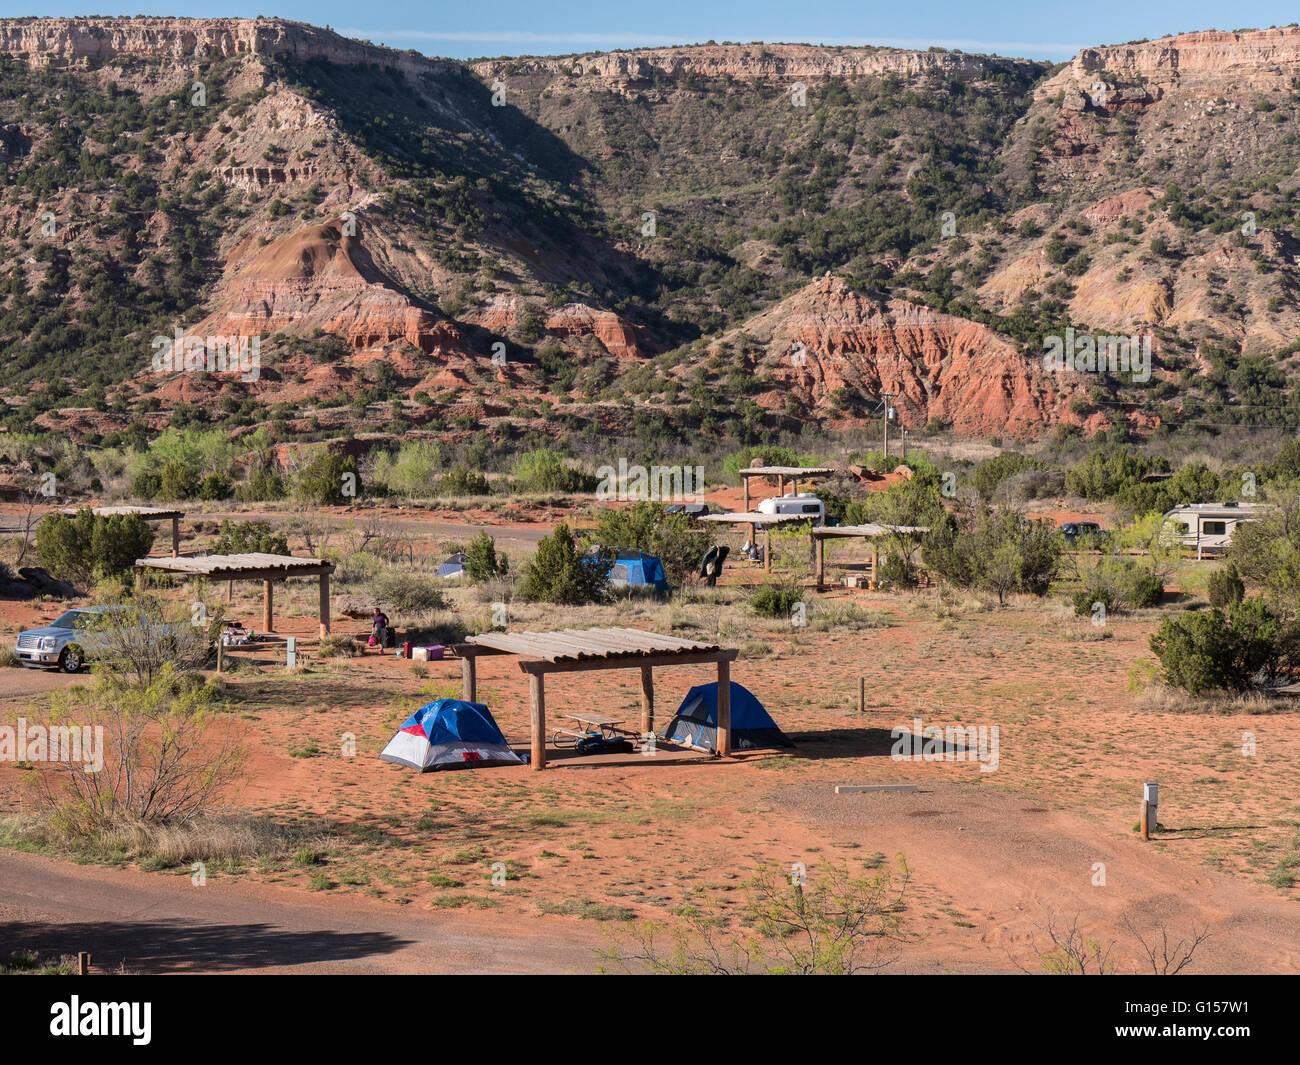 Mesquite Camp Area Palo Duro State Park Texas Stock